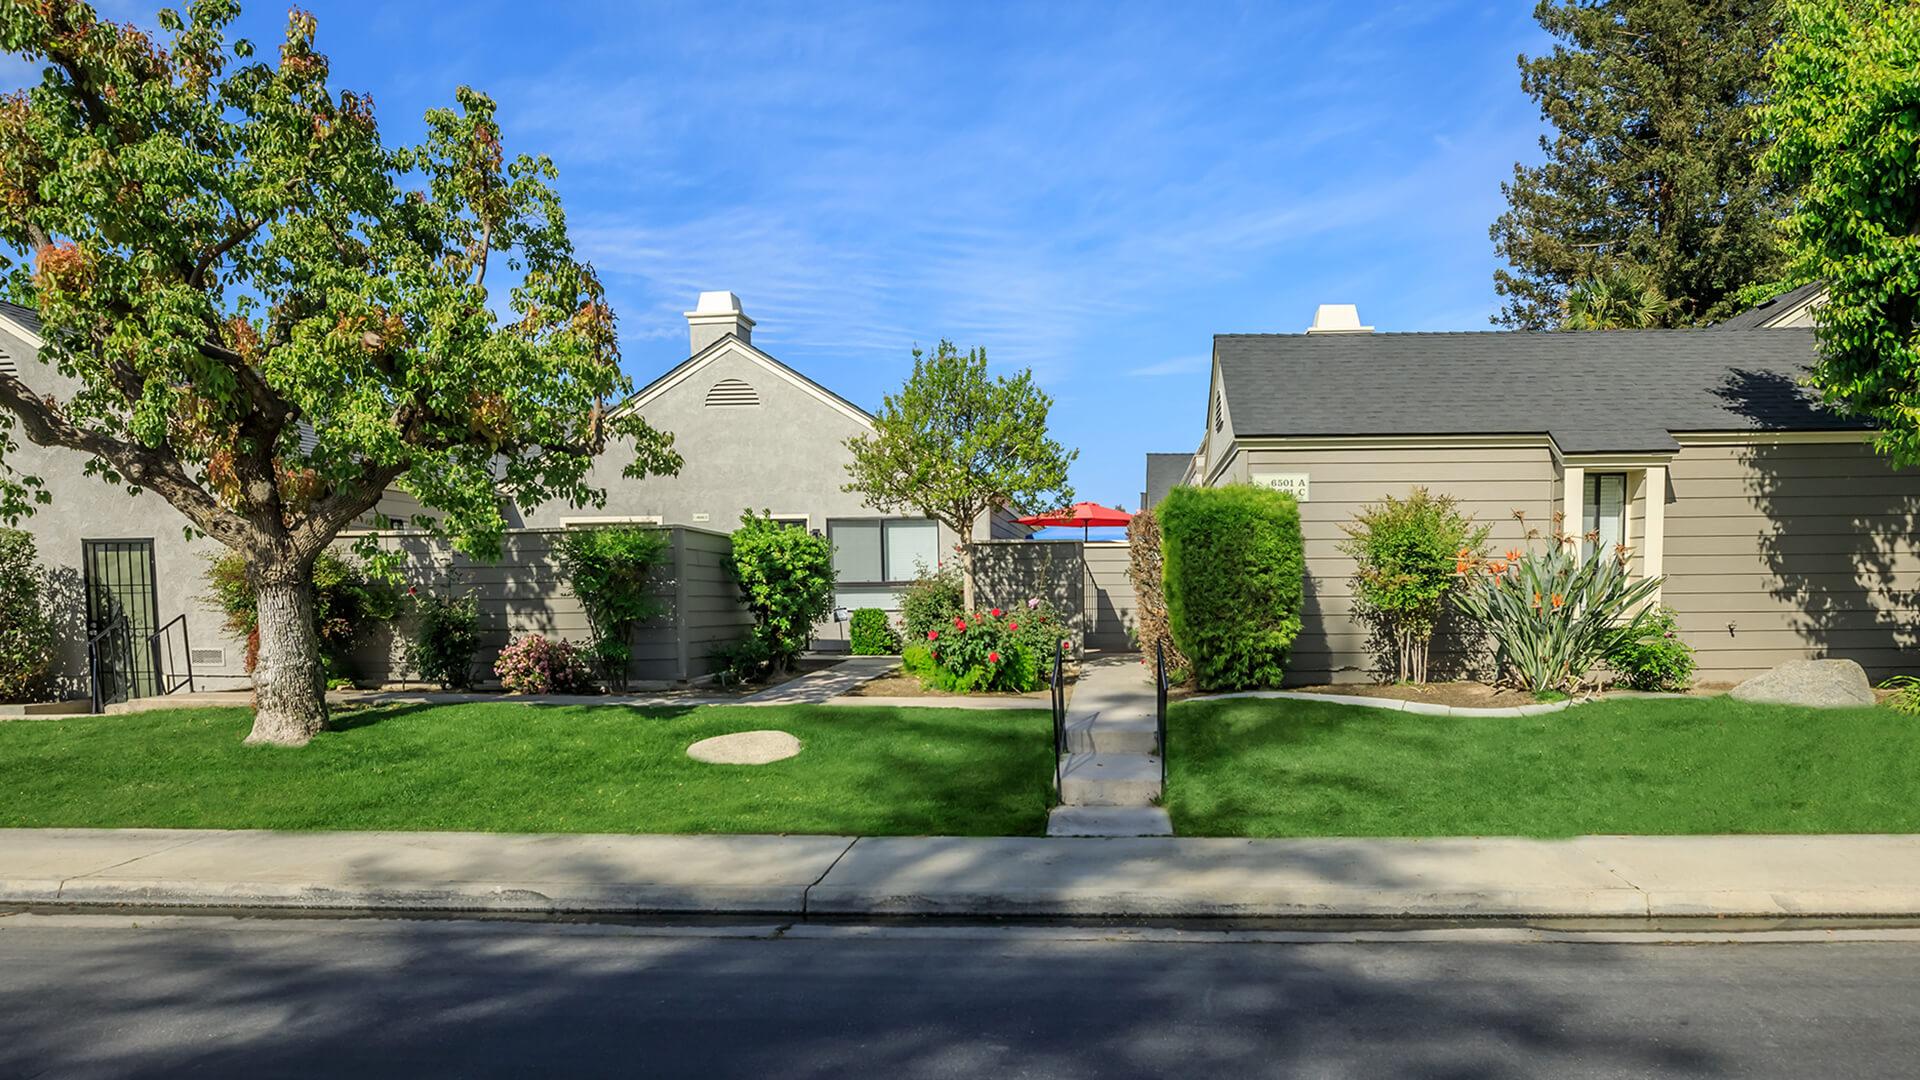 Laurelwood Gardens West Villas Apartment Homes In